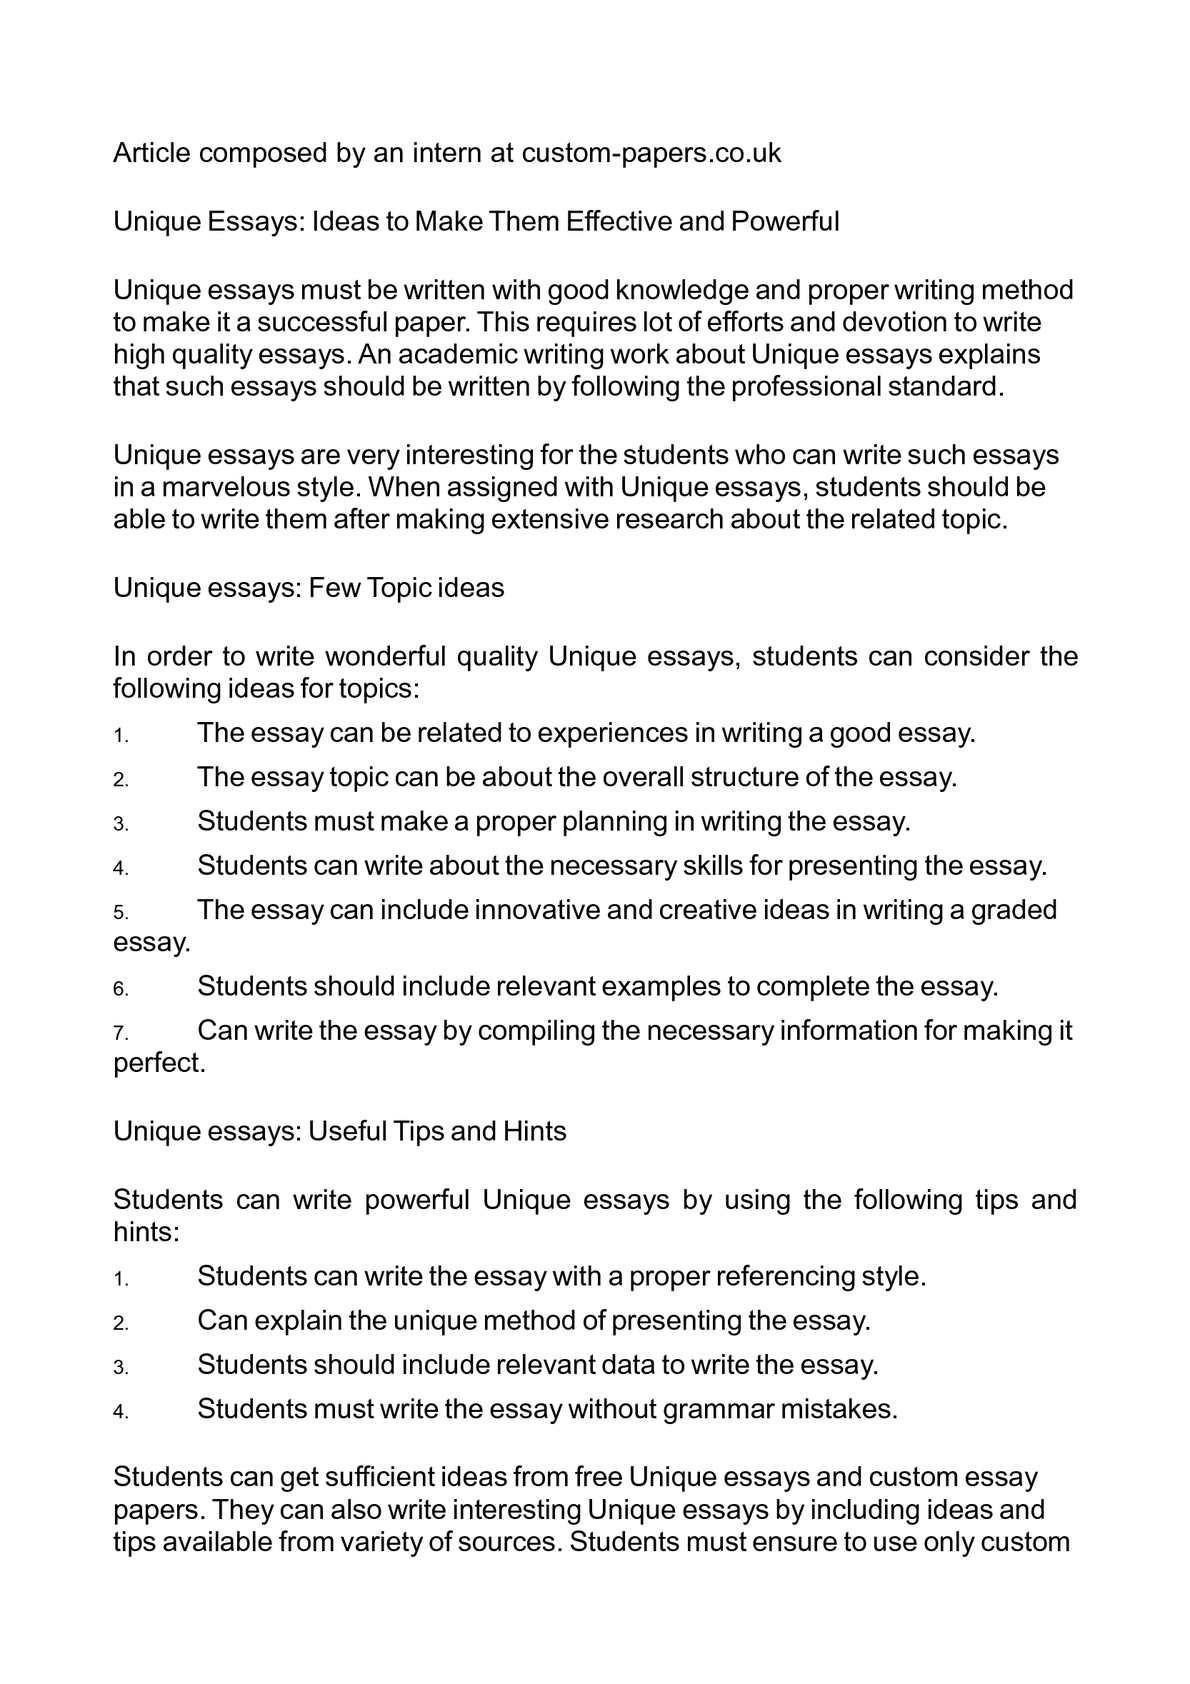 010 Essay Example P1 Marvelous Breathtaking Essays English Discount Code Uk Full